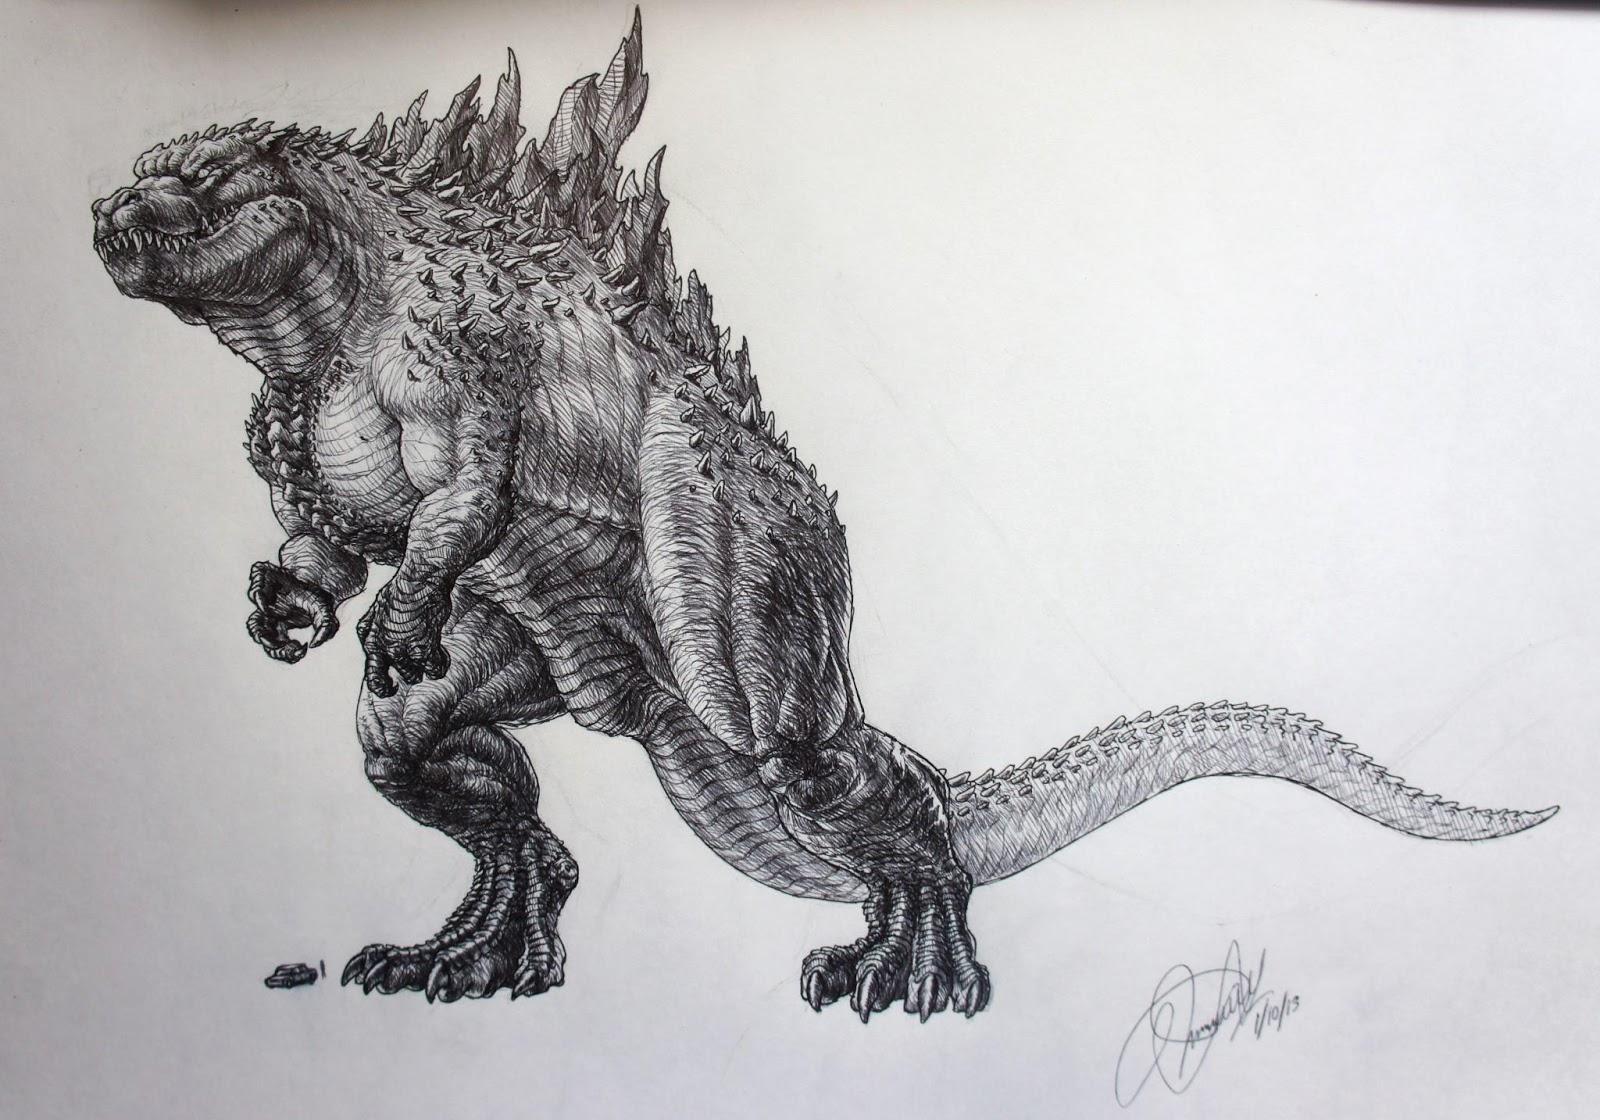 Dibujos Godzilla Raids Again 1955 Para Colorear: Godzilla's Design, Change It Or No?